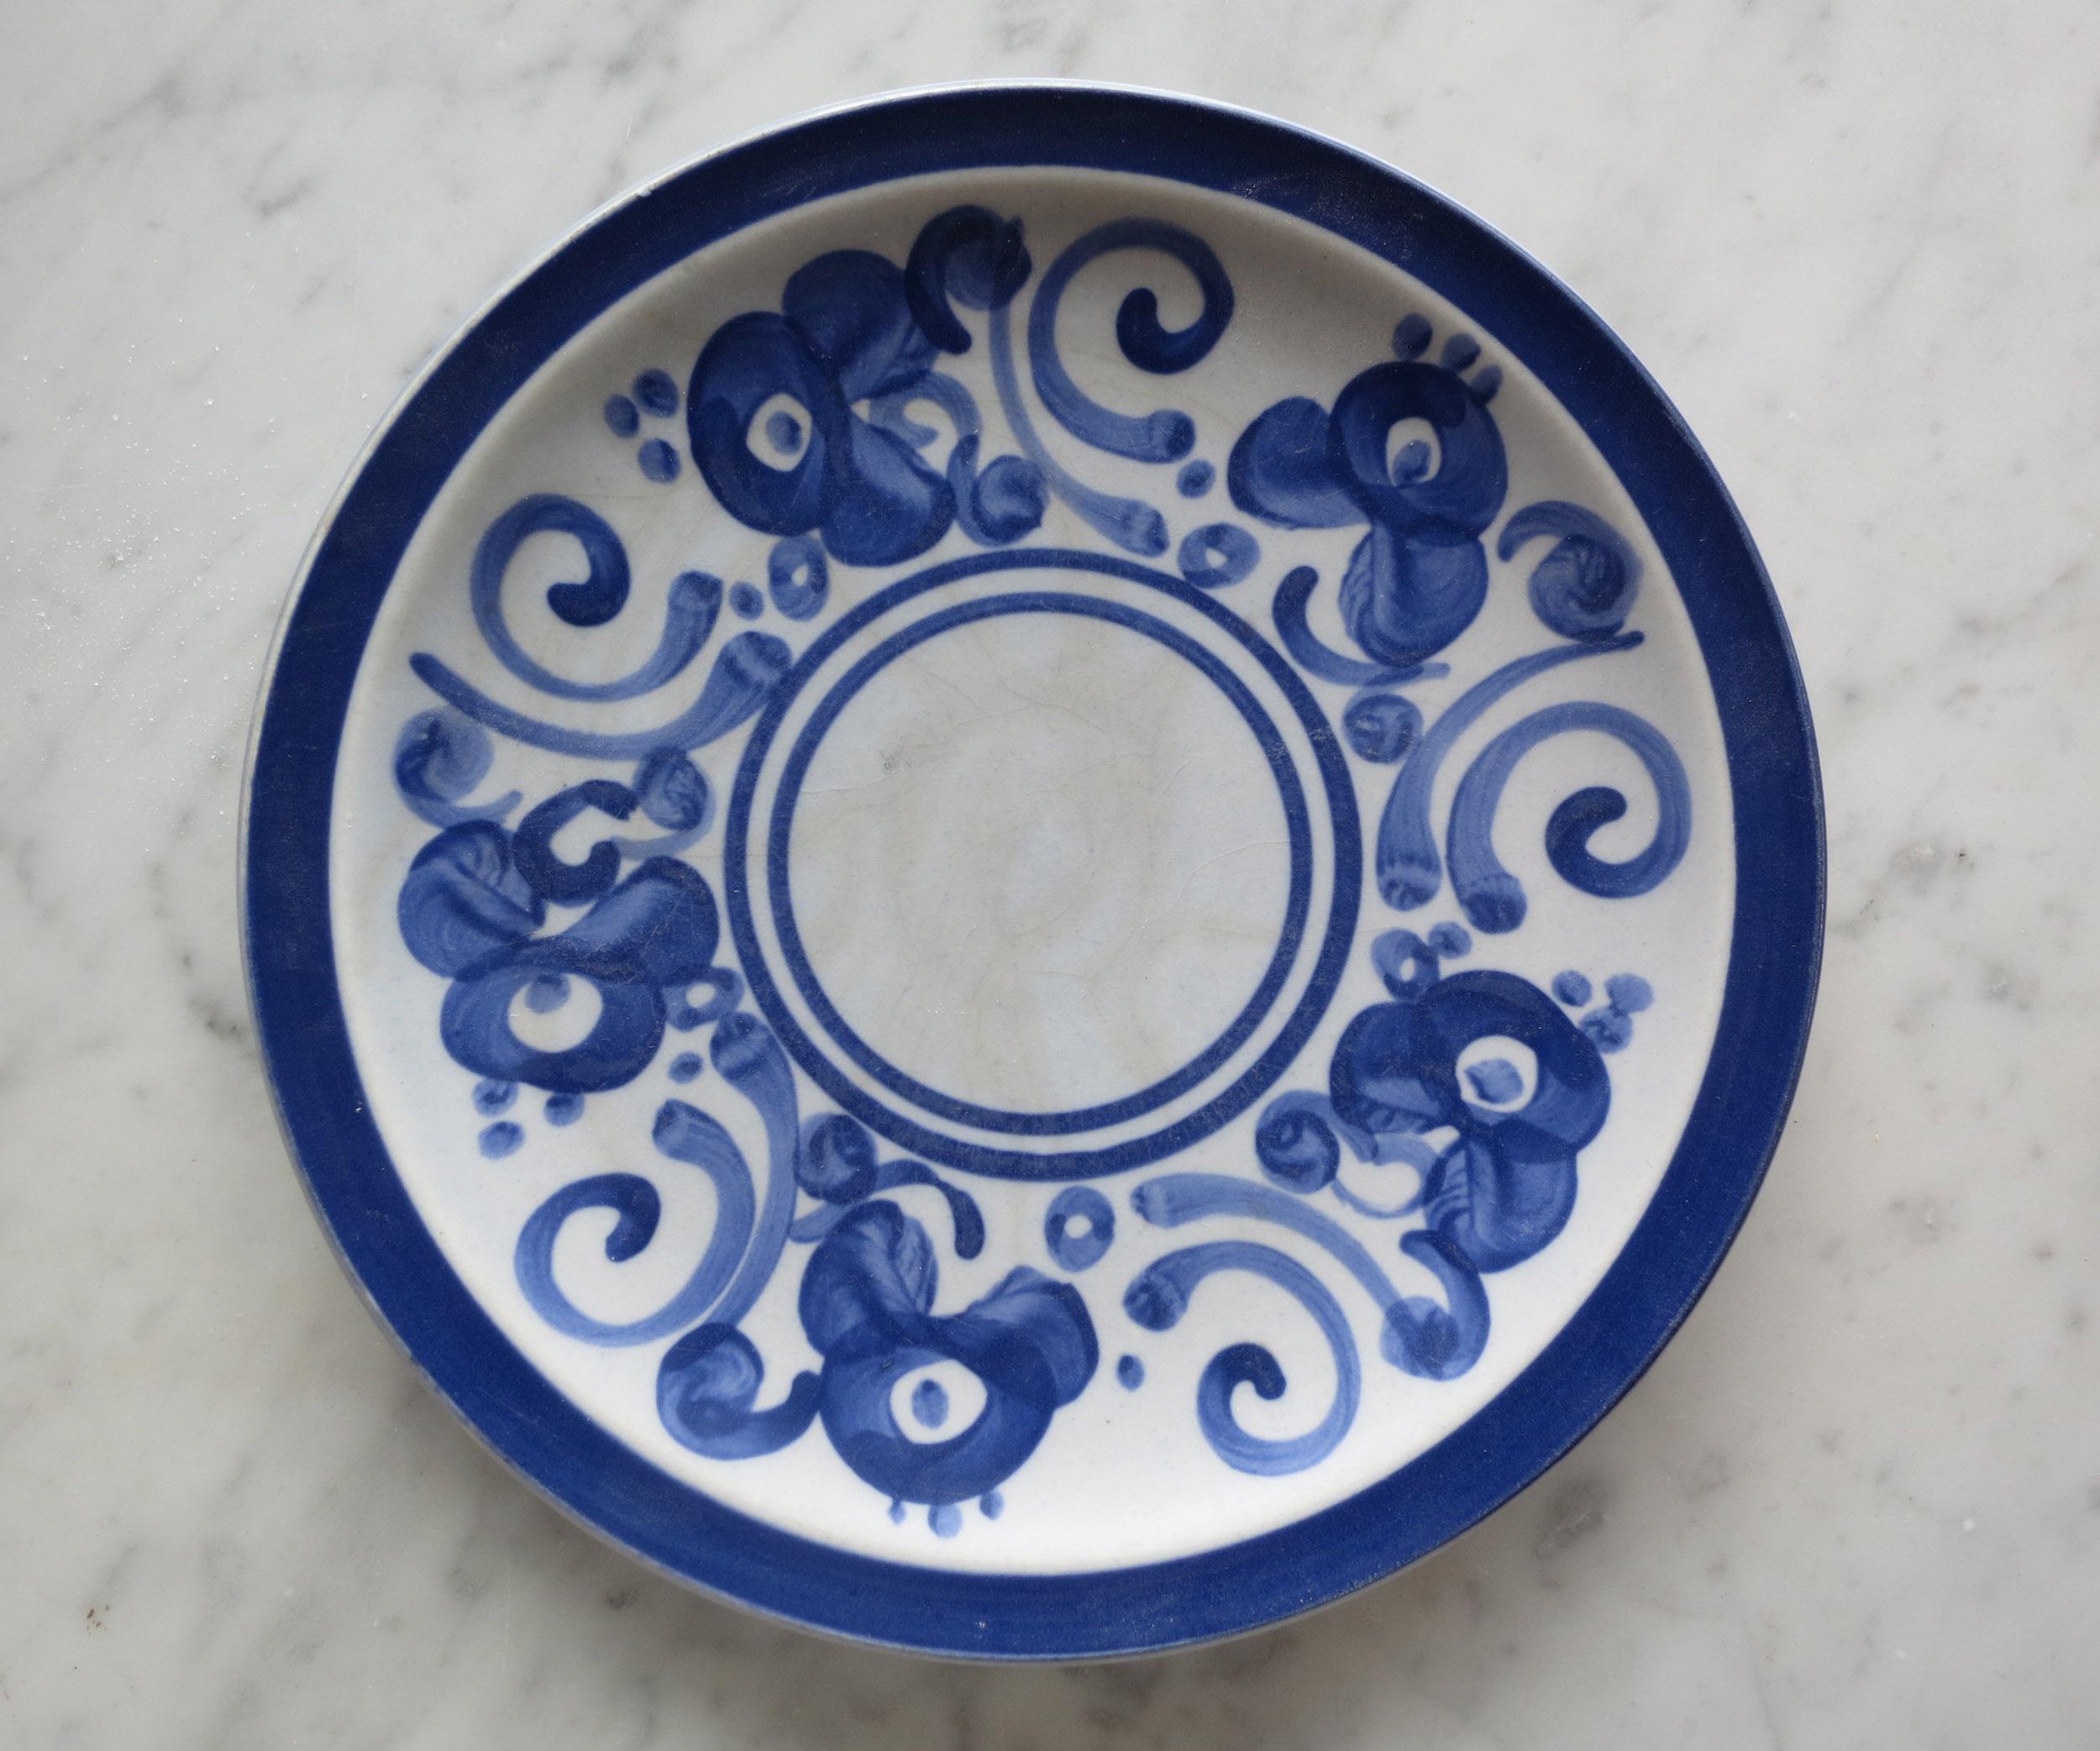 An original Lapid's Arabesque plate